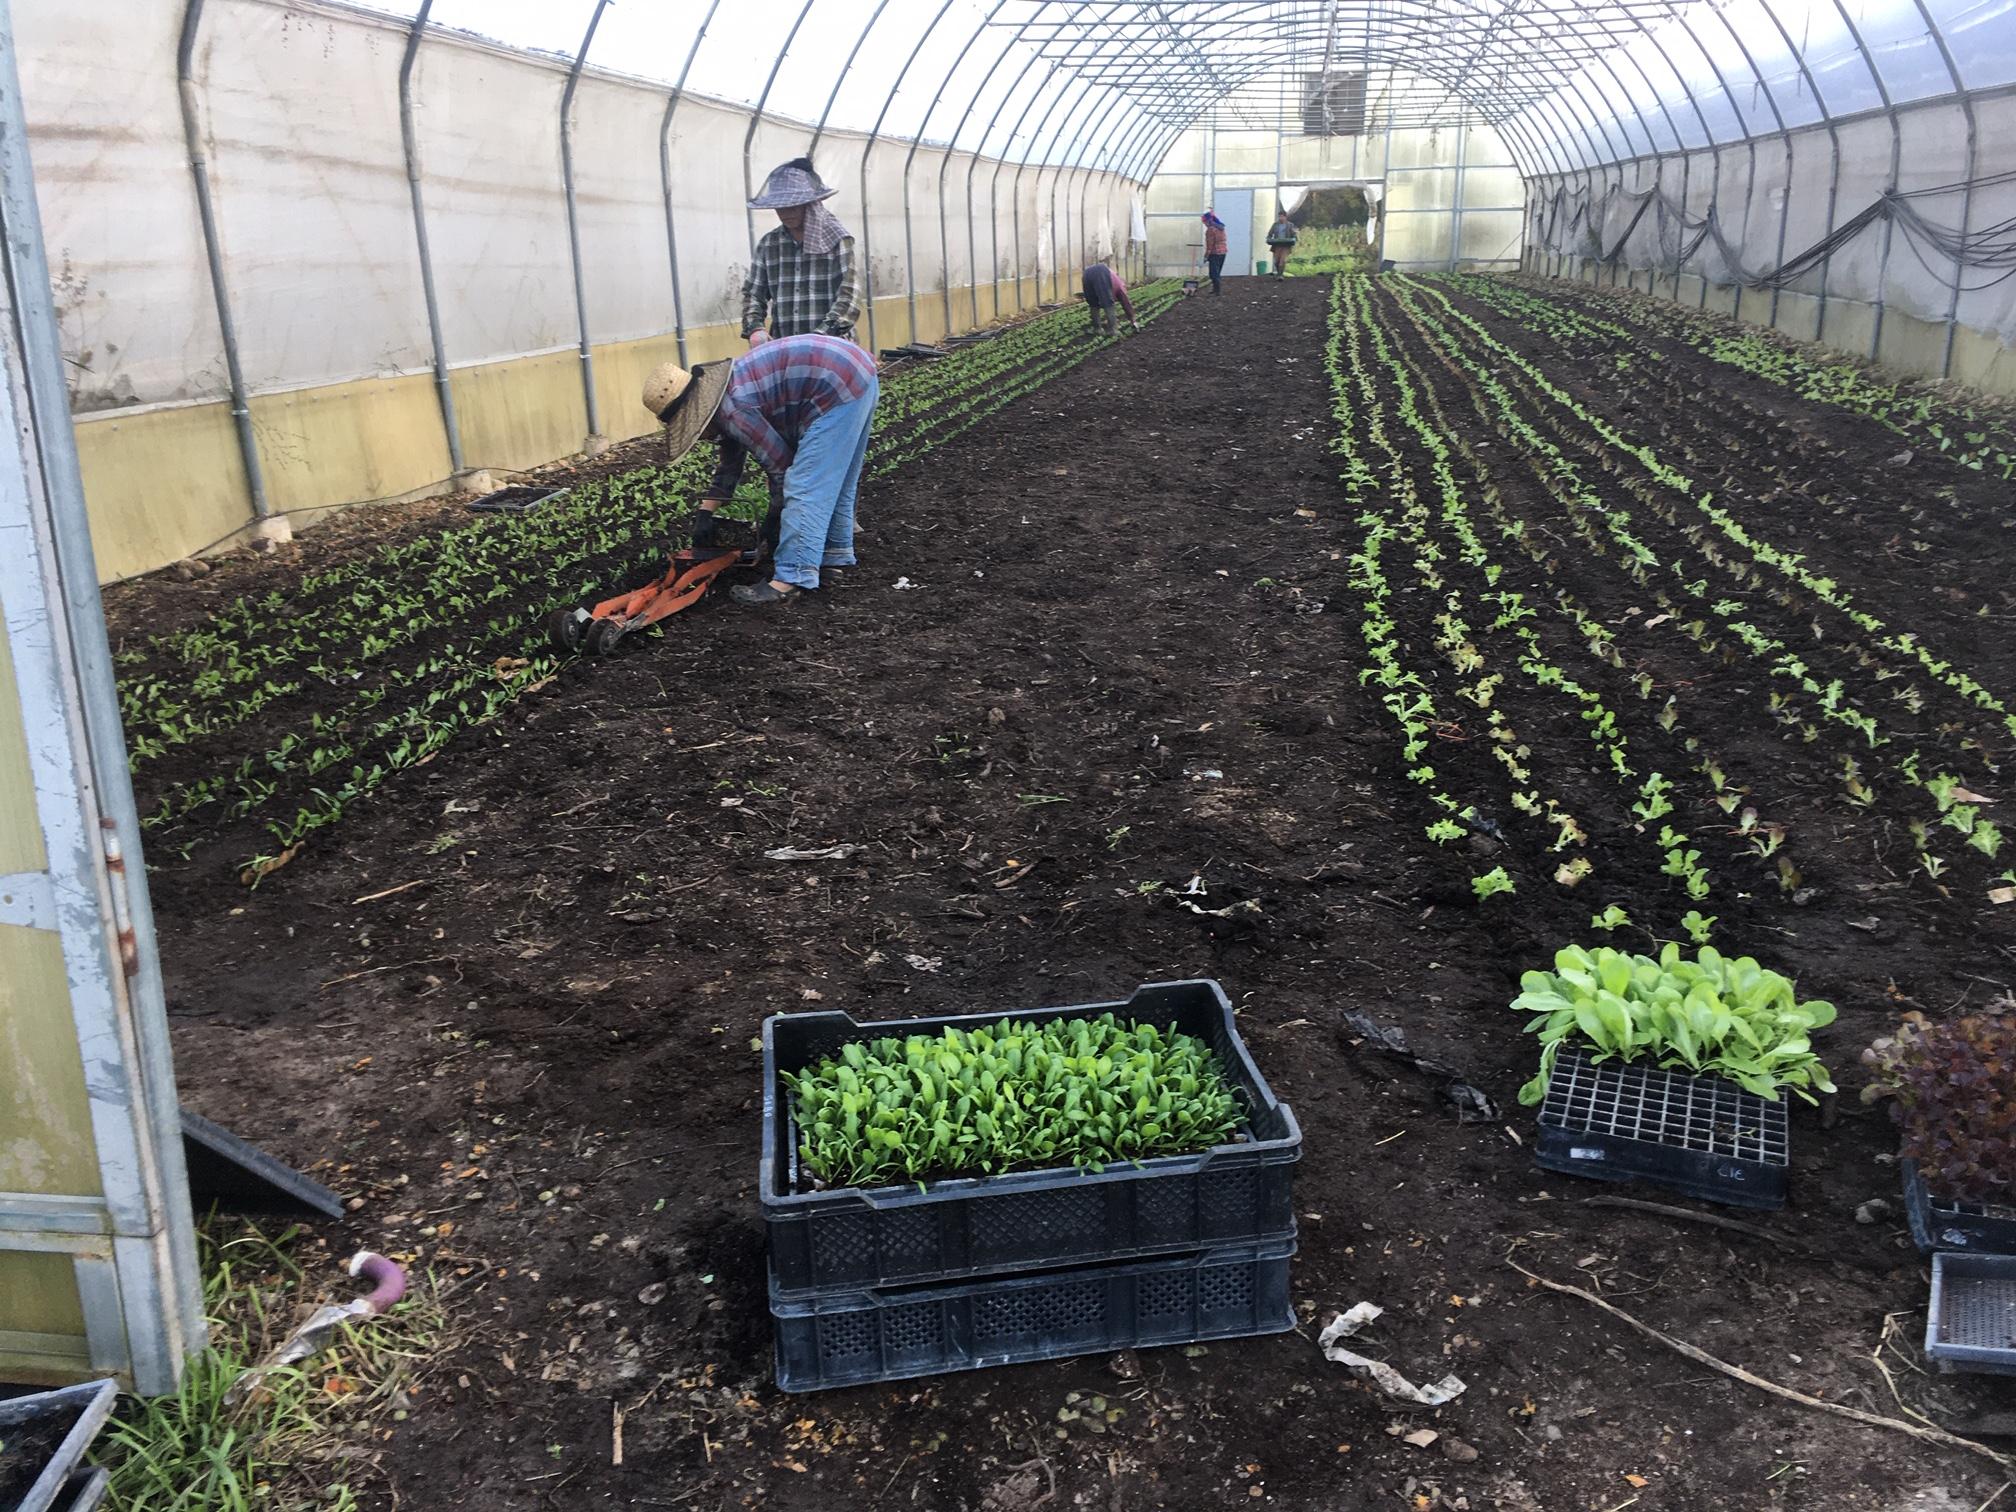 Farm Happenings for October 16, 2019